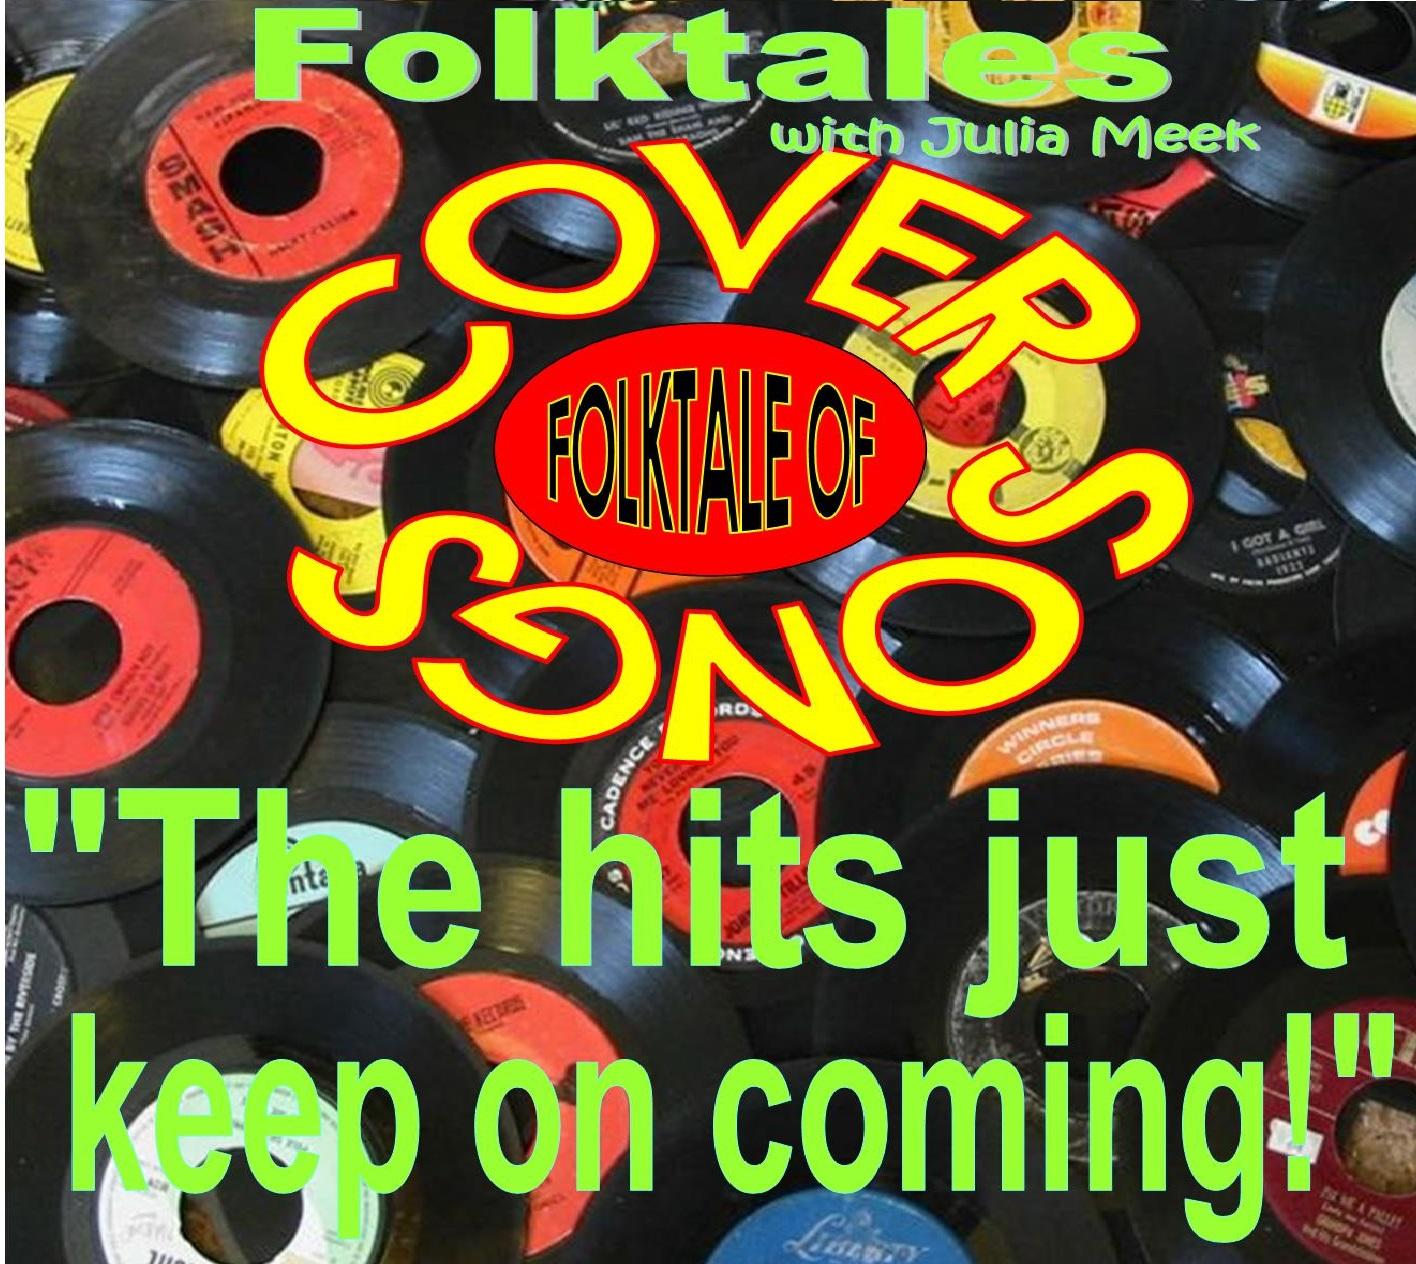 Caption: WBOI's Folktale of Cover Songs, Credit: Julia Meek